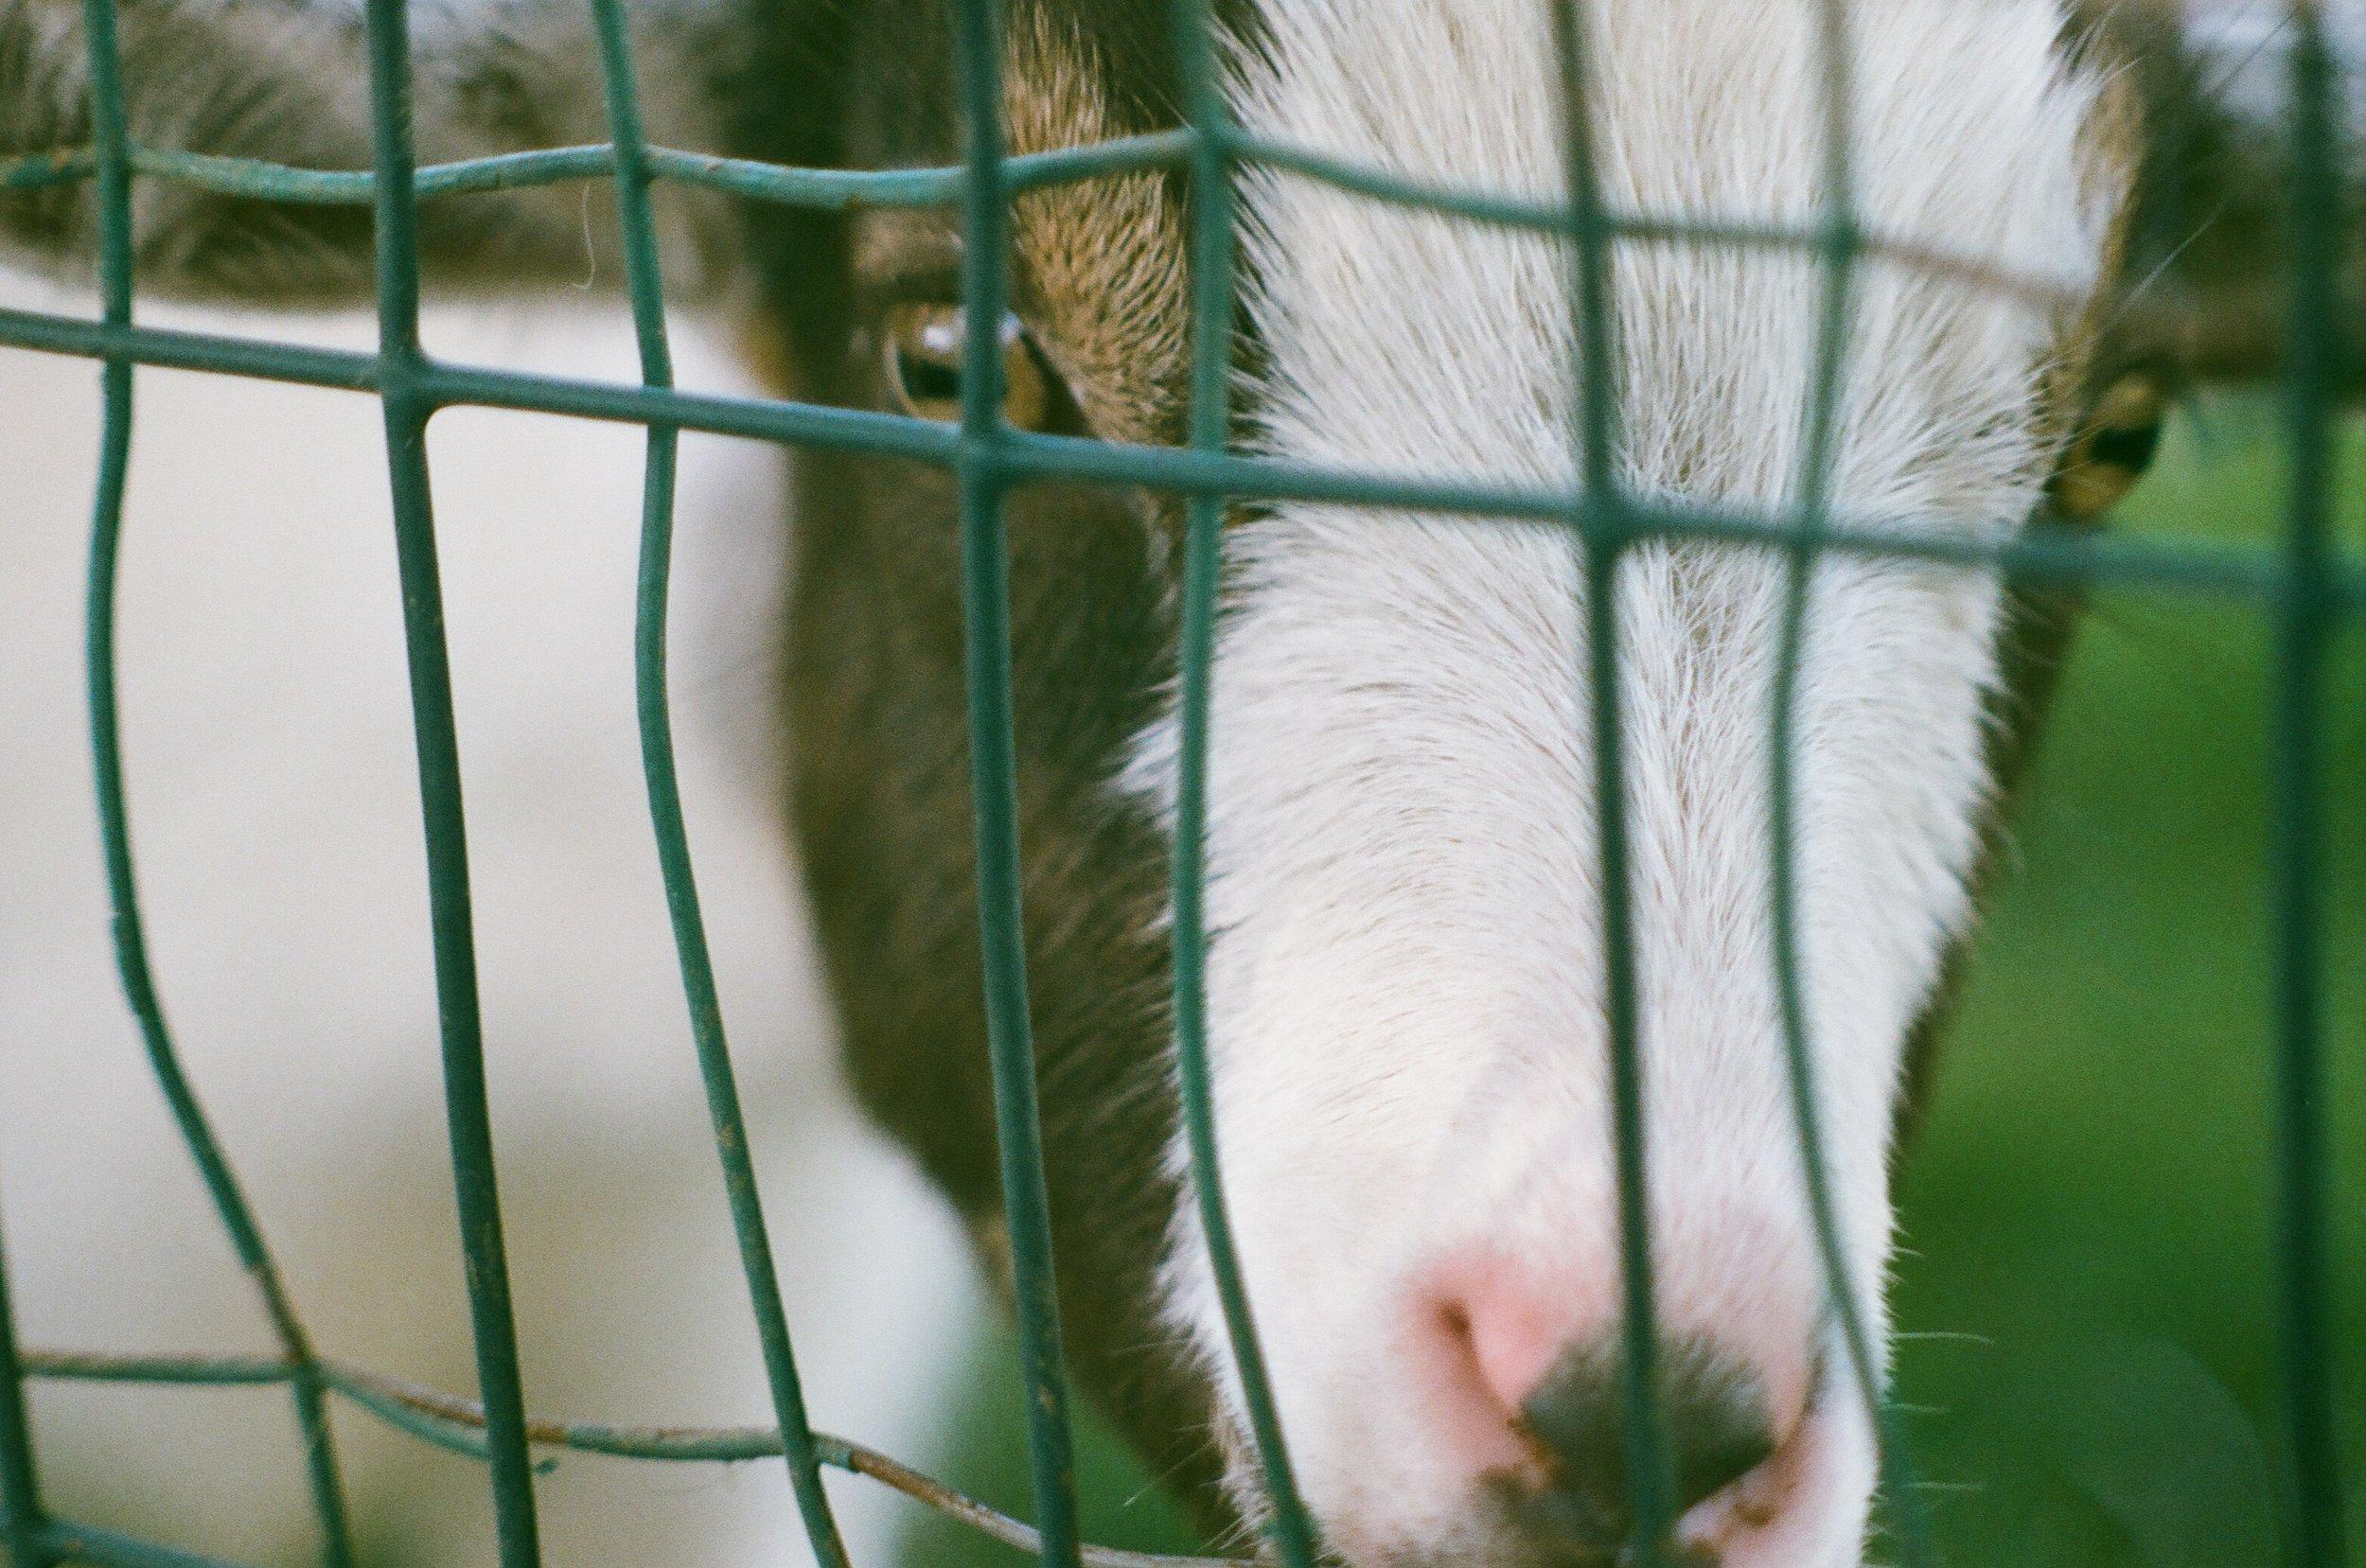 Goat_Up_close.jpg